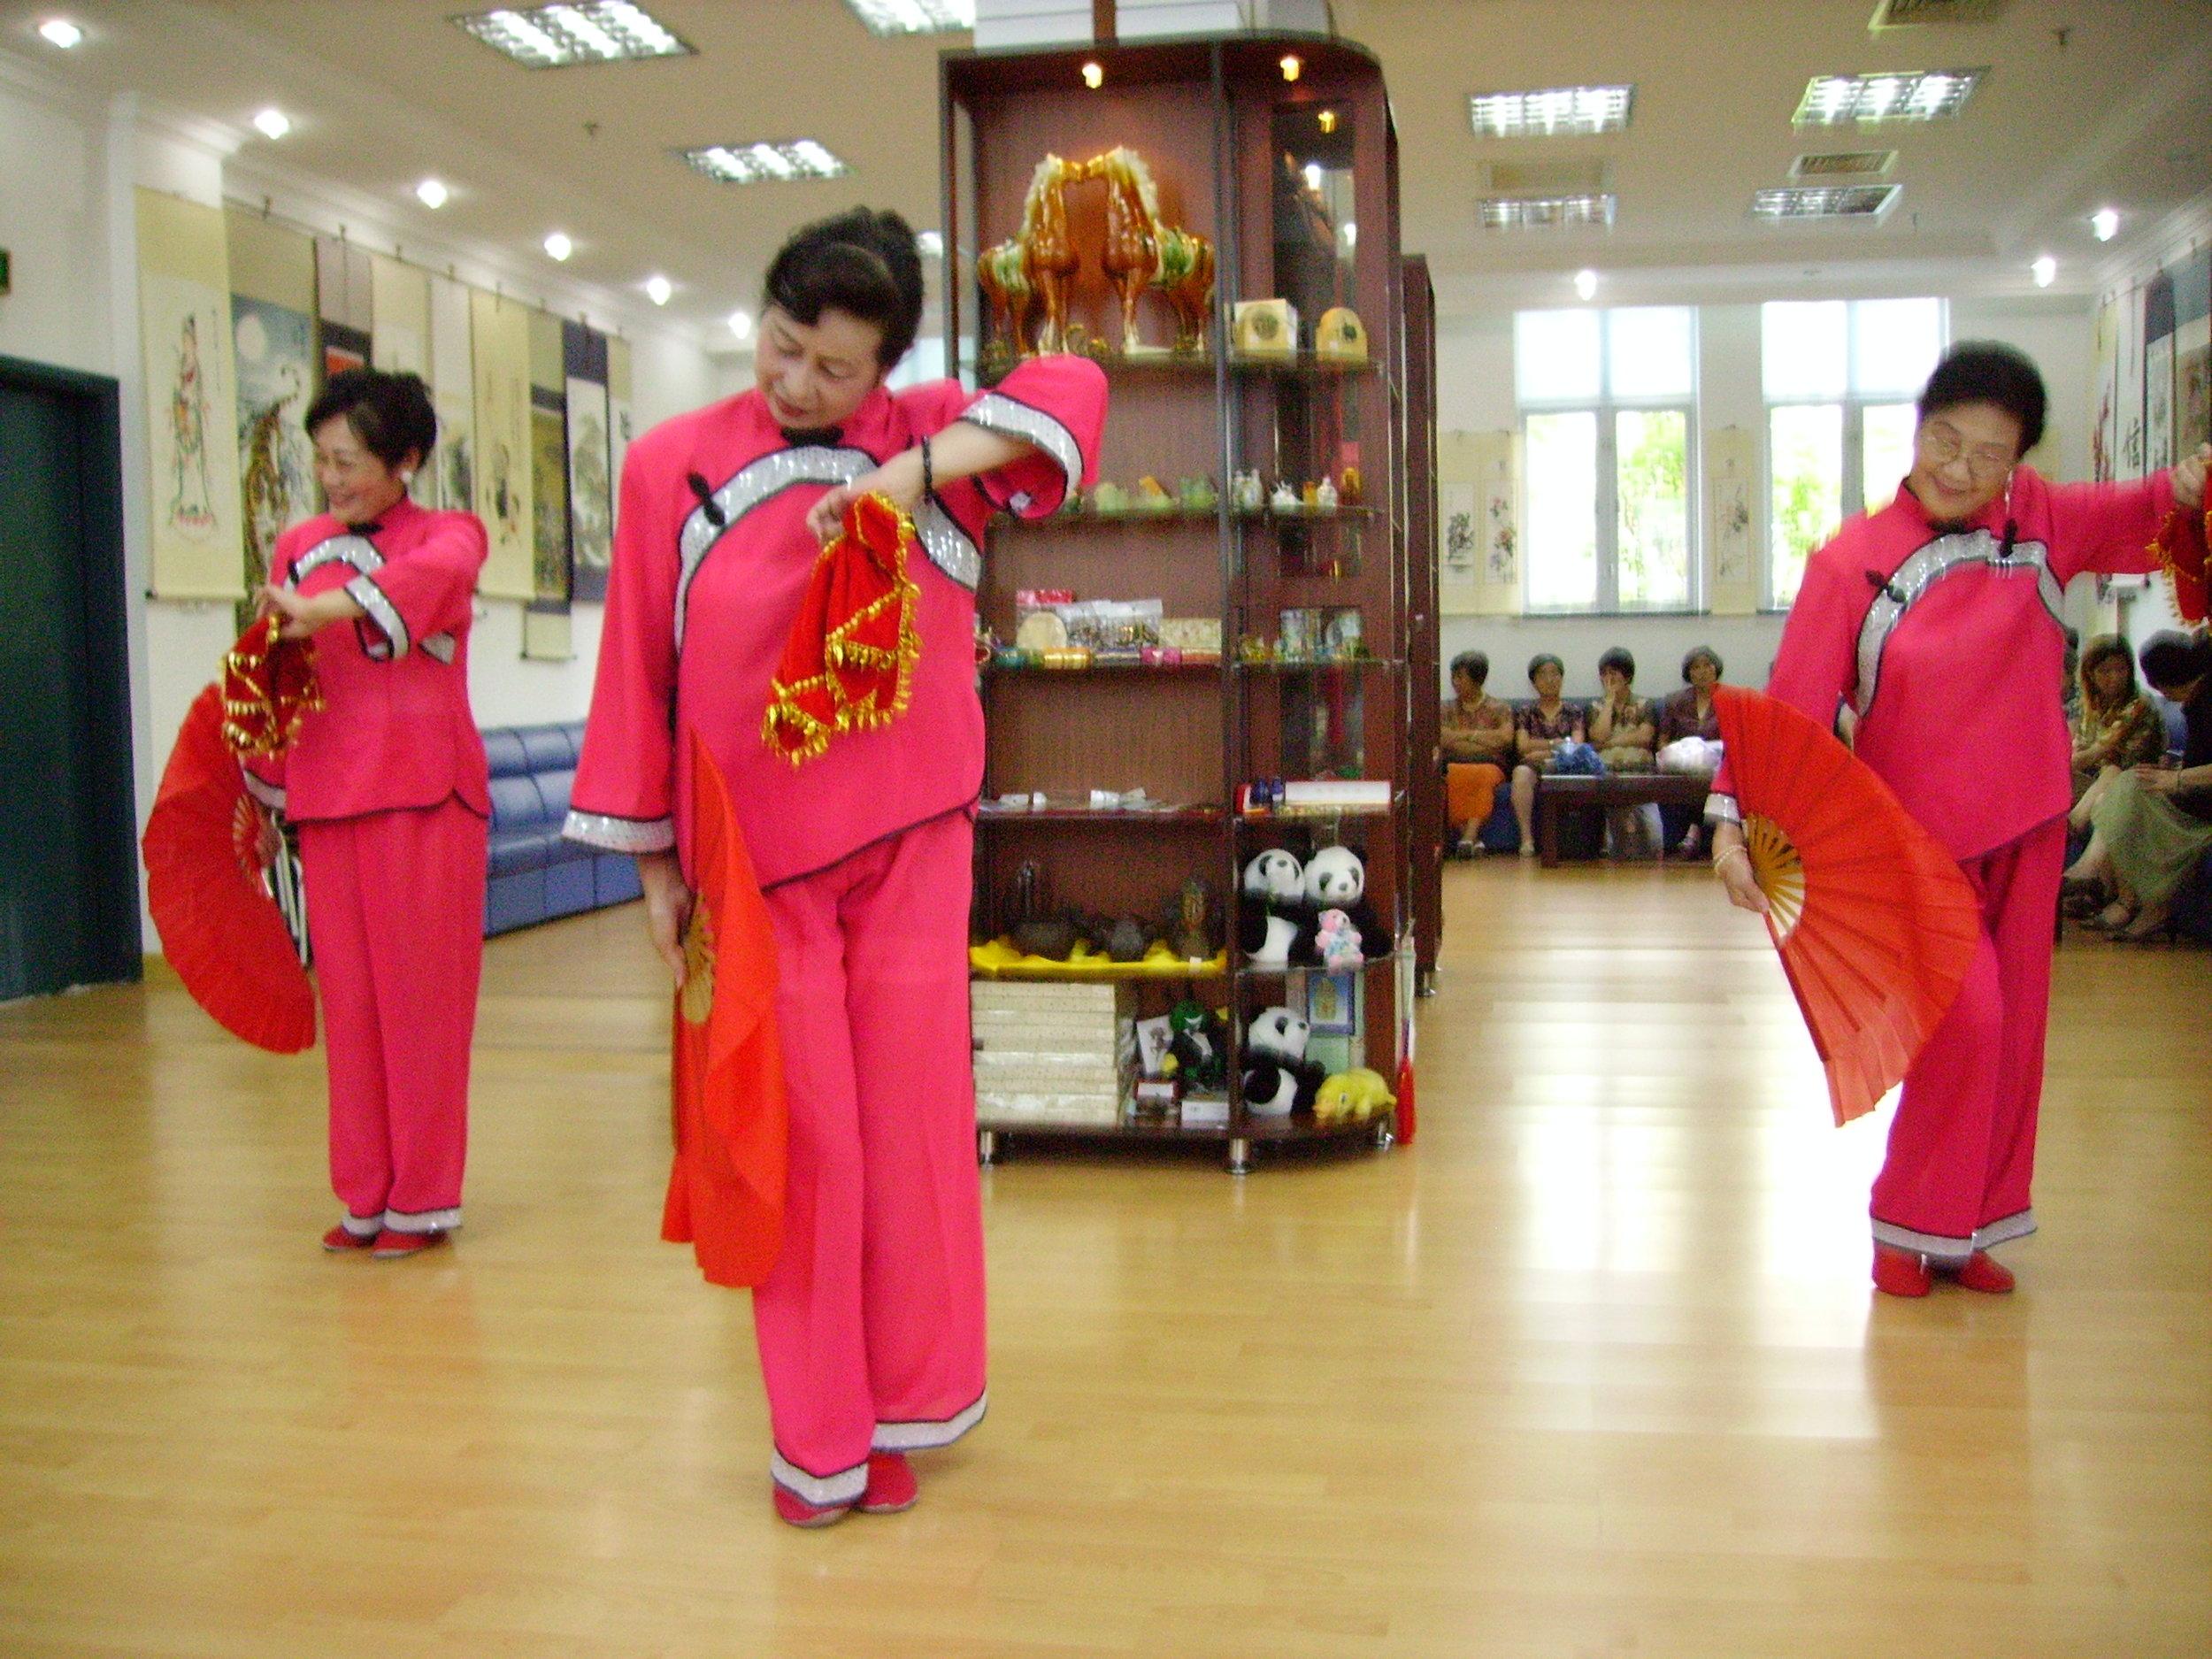 Women dancing in the culture centre, China, Clark Zlotchew, 2005